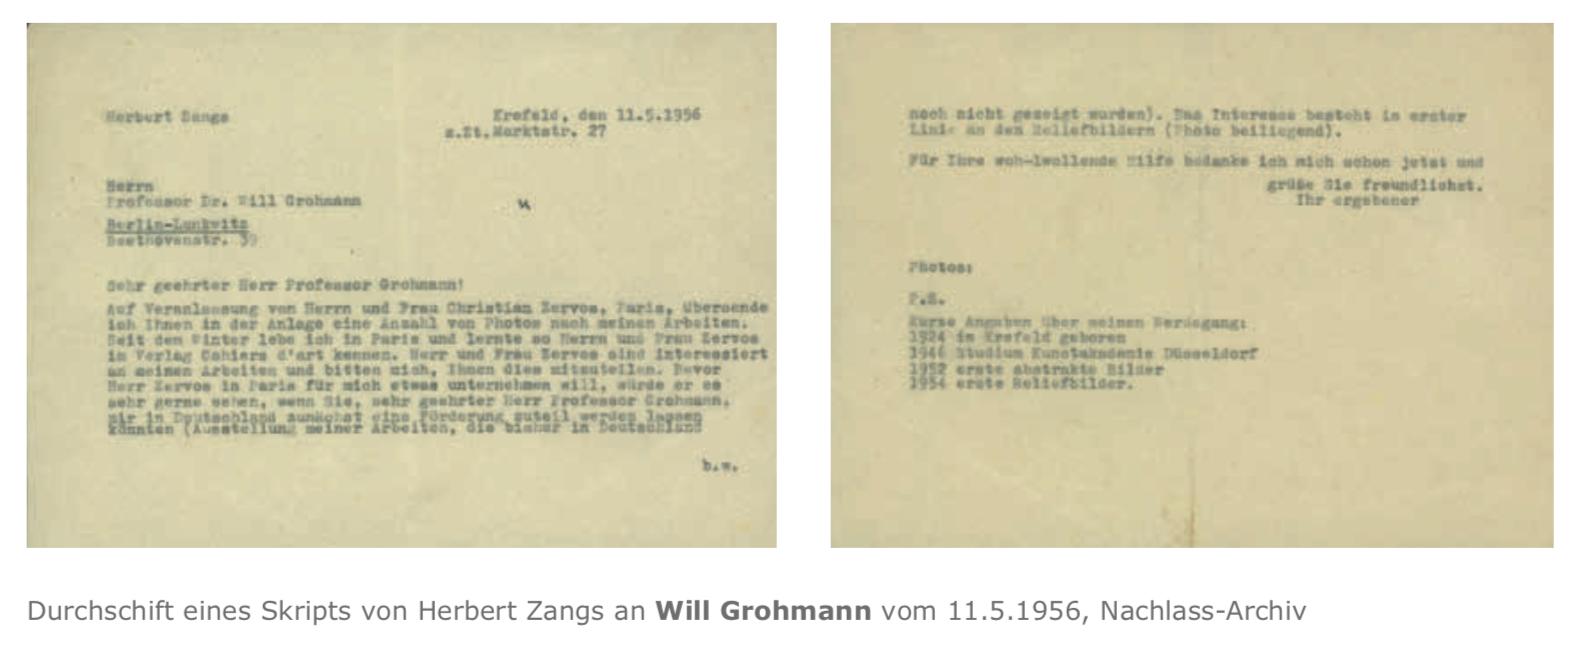 Galerie Maulberger Skript Herbert Zangs Publikation Zeitzeugen Seite 128